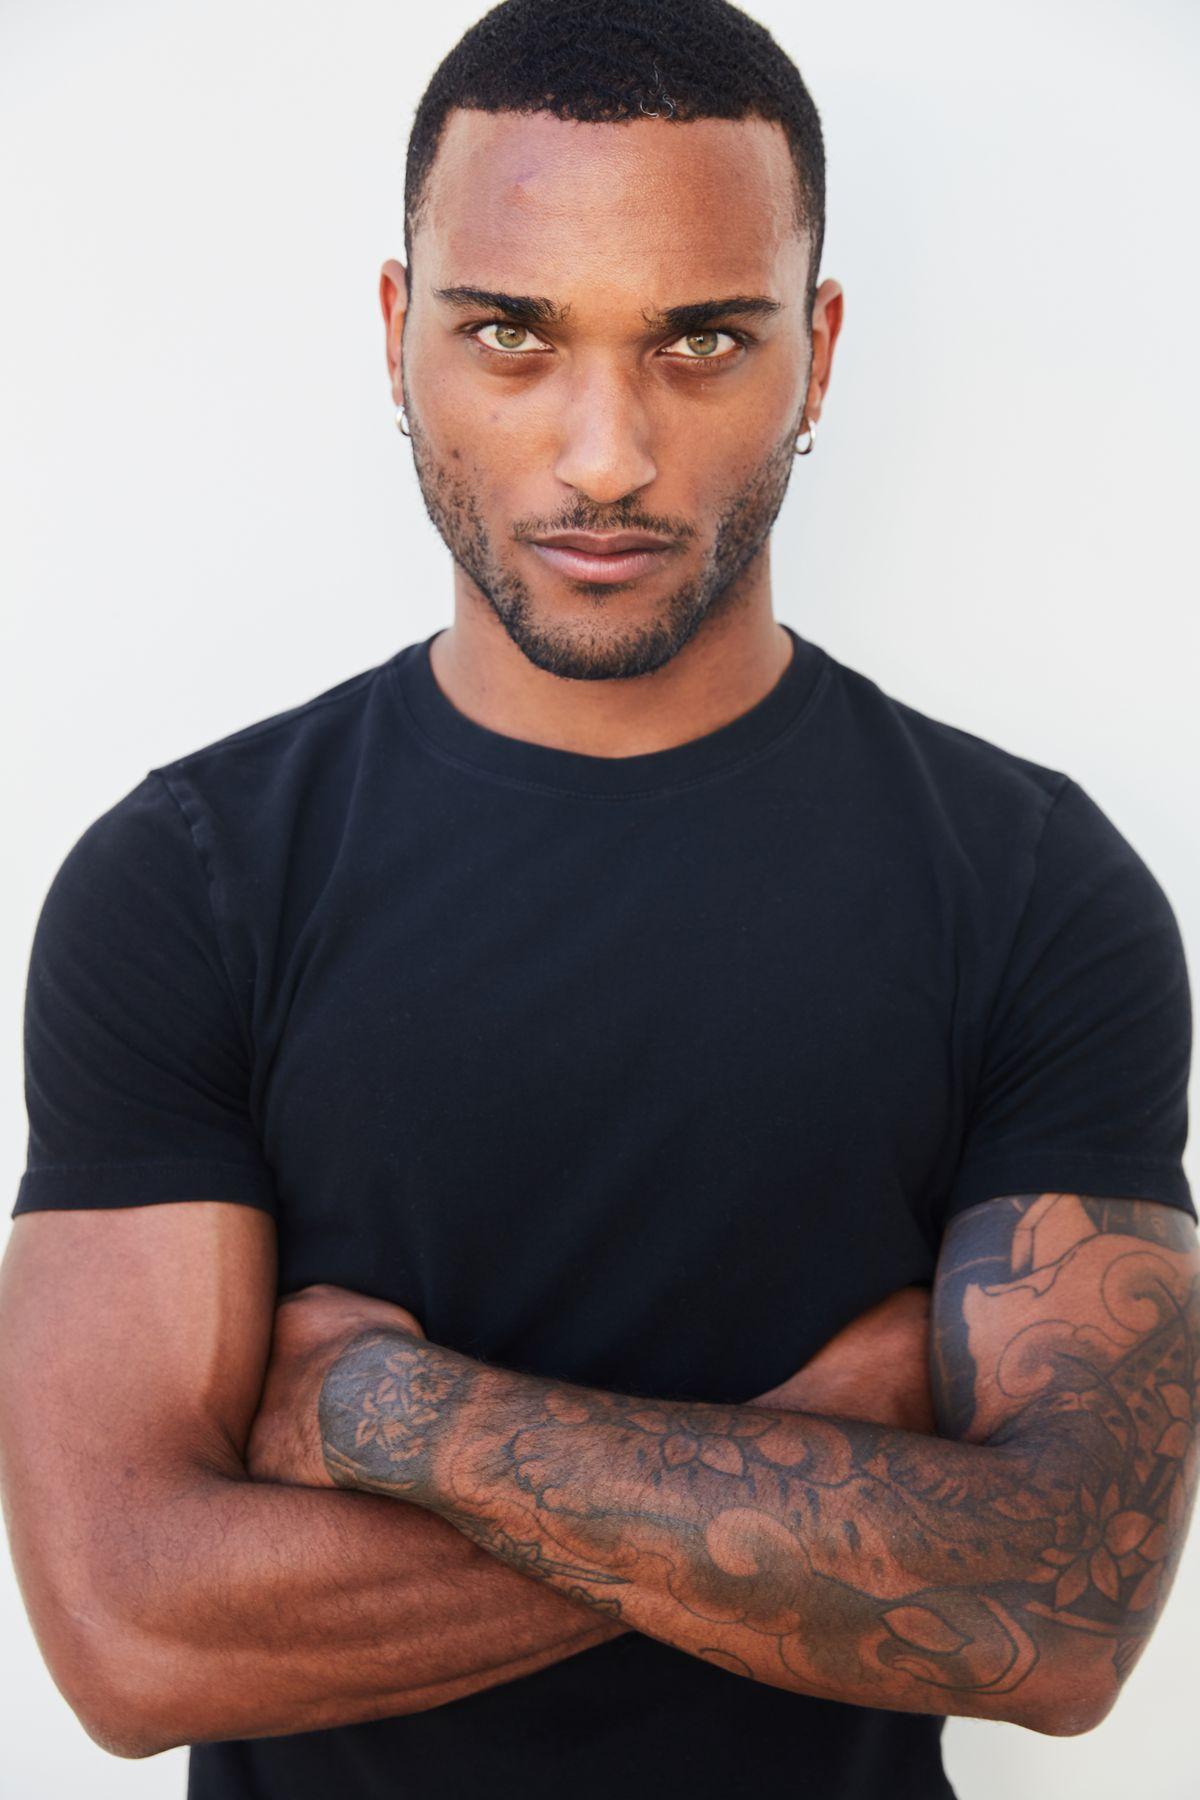 Model Chris West